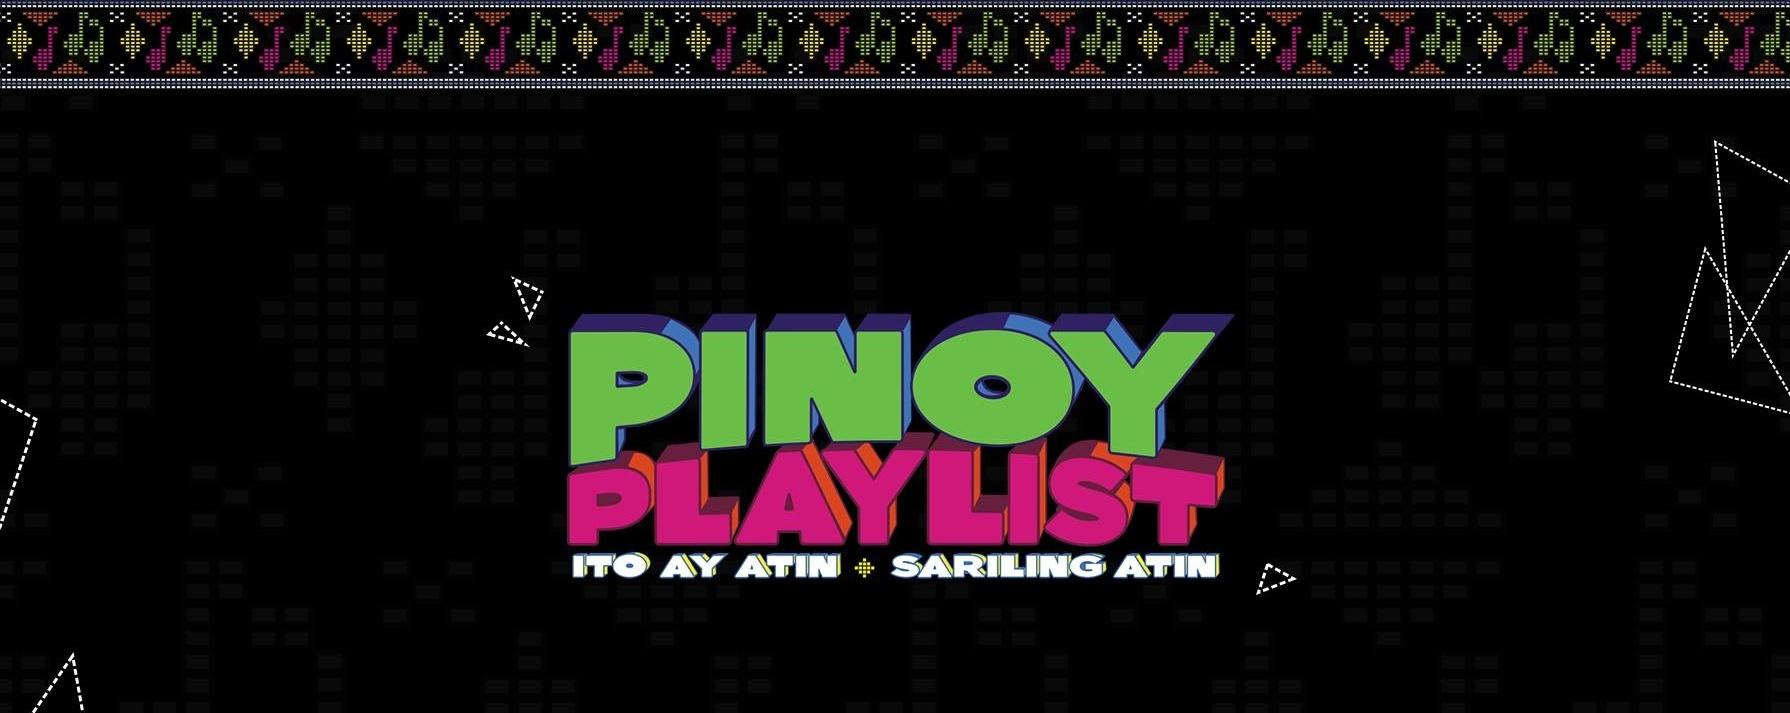 Pinoy Playlist 2018